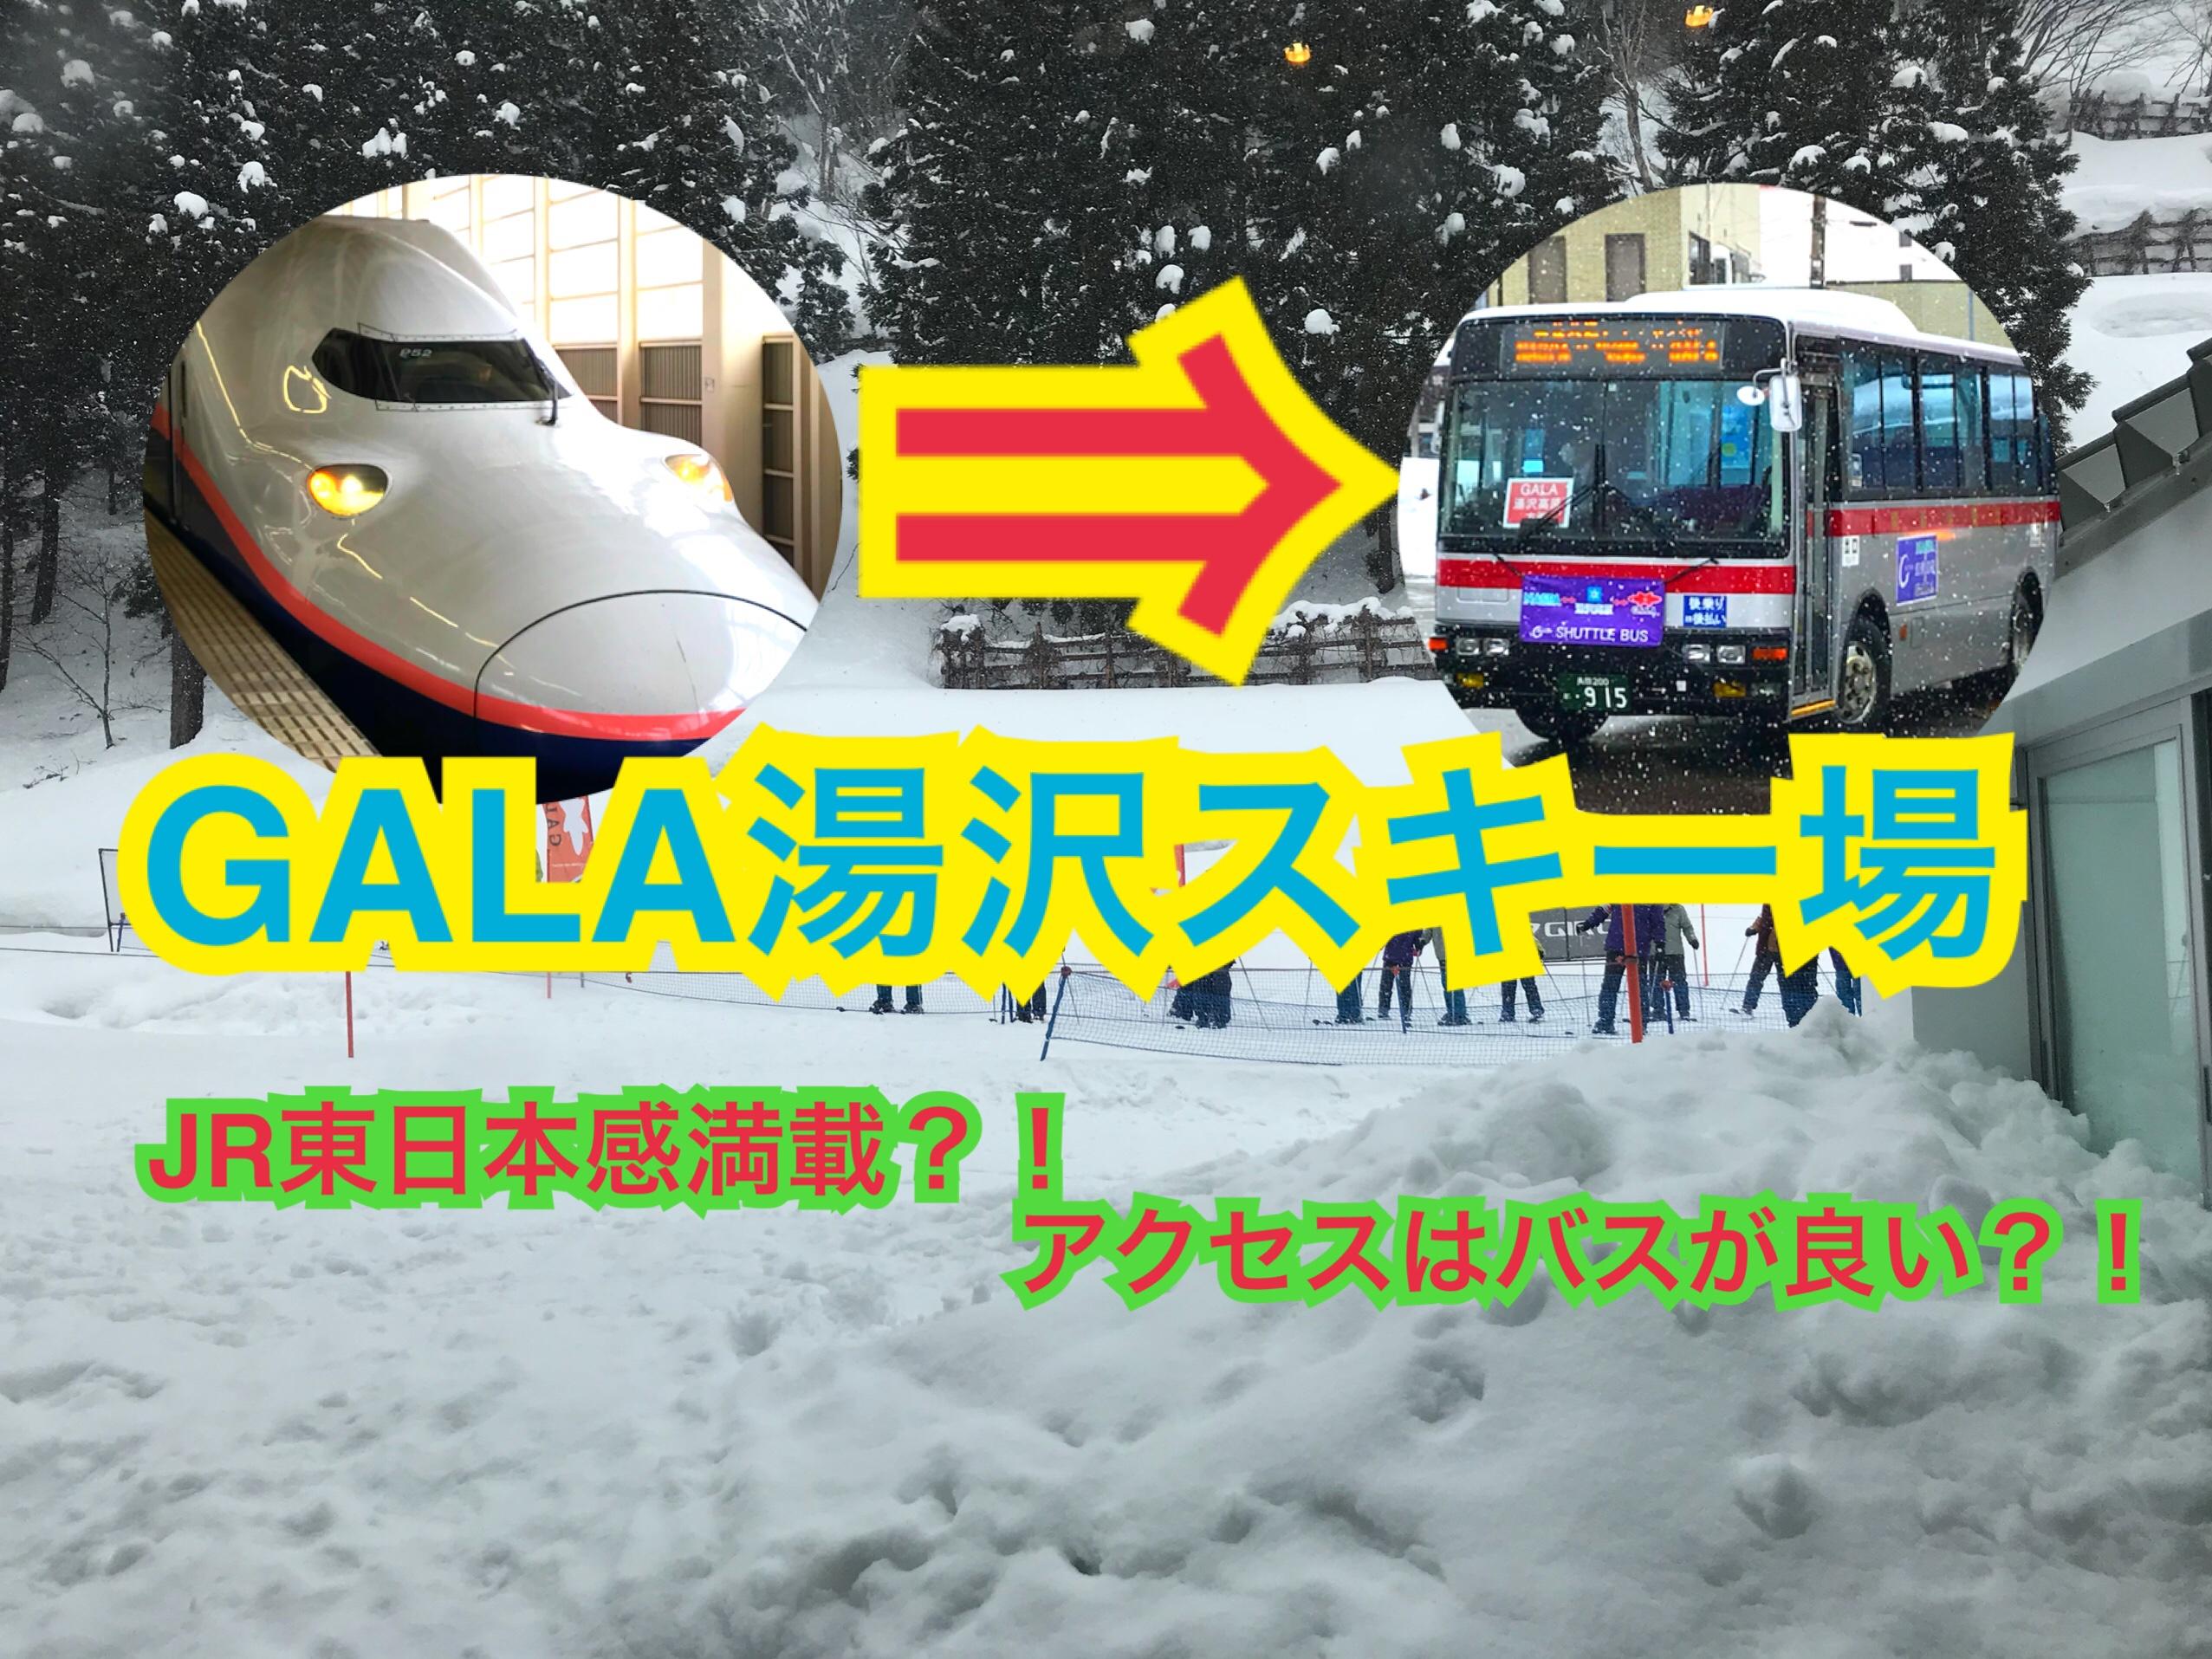 JR東日本のスキー場、ガーラ湯沢へはバスが便利?!【雪国周遊旅】